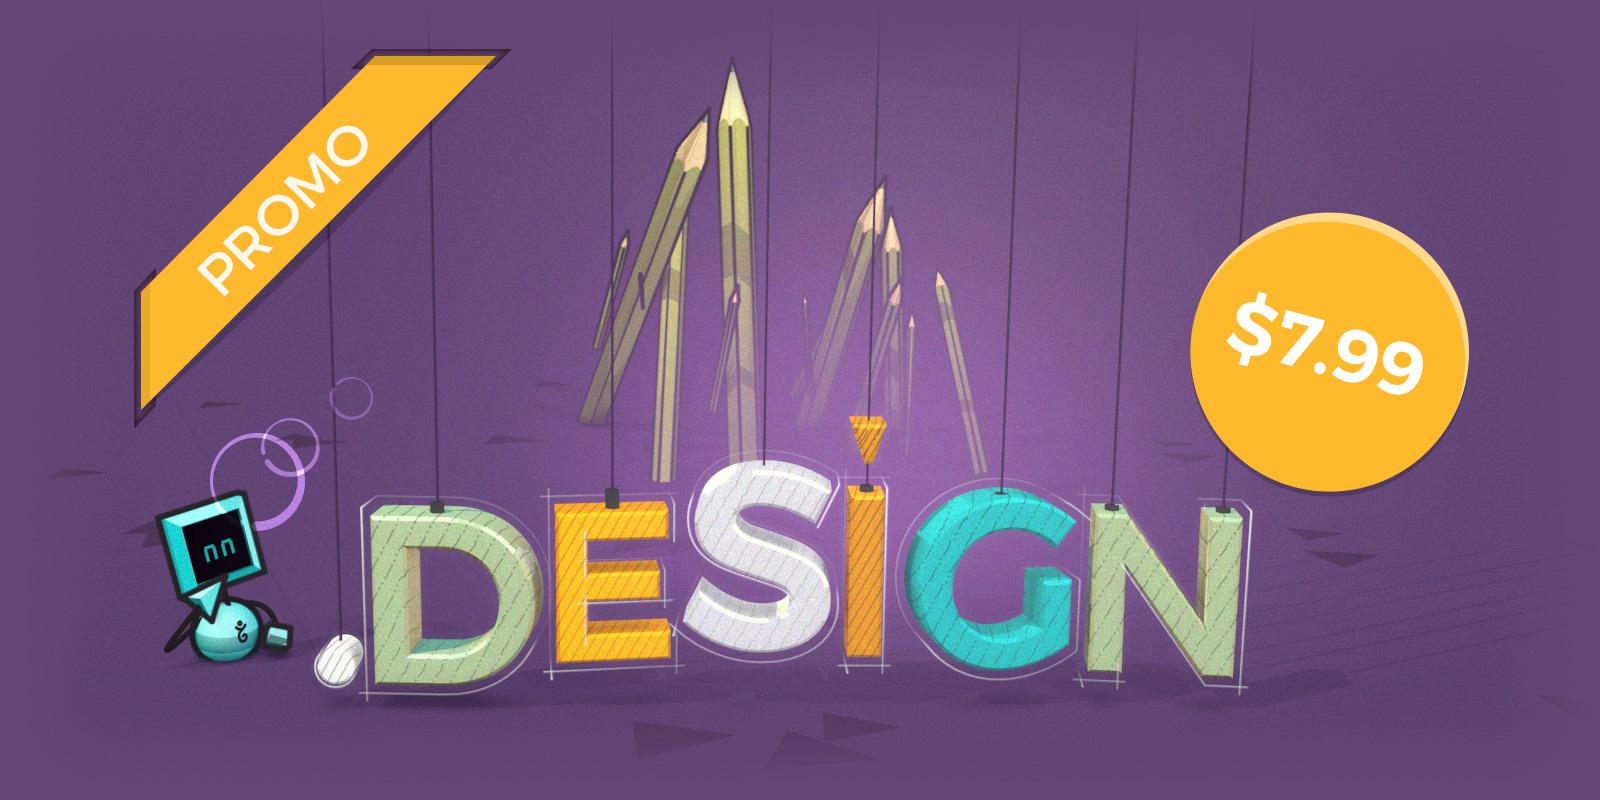 Create your own .design through June